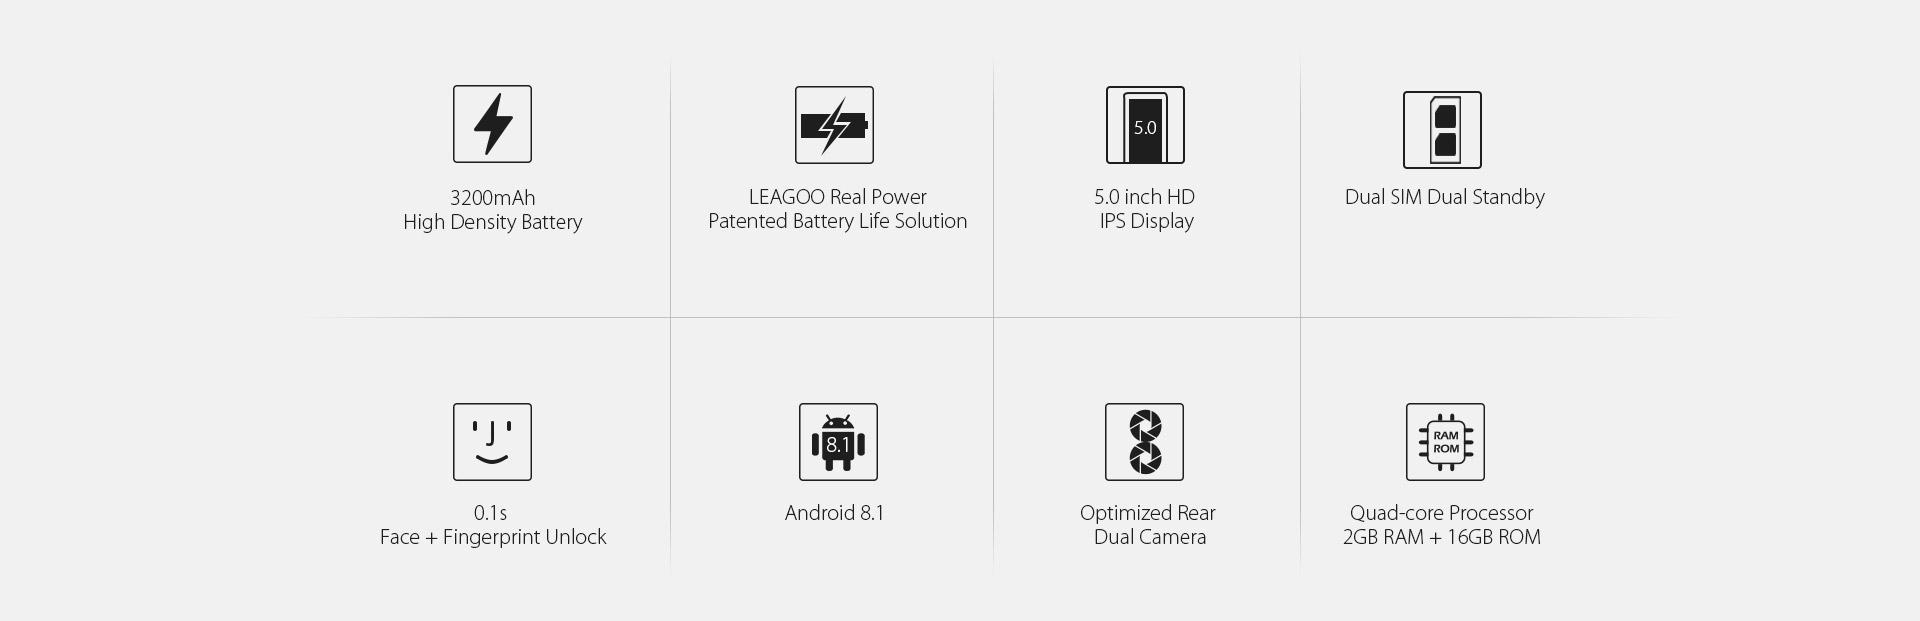 Acheter Leagoo Power 2